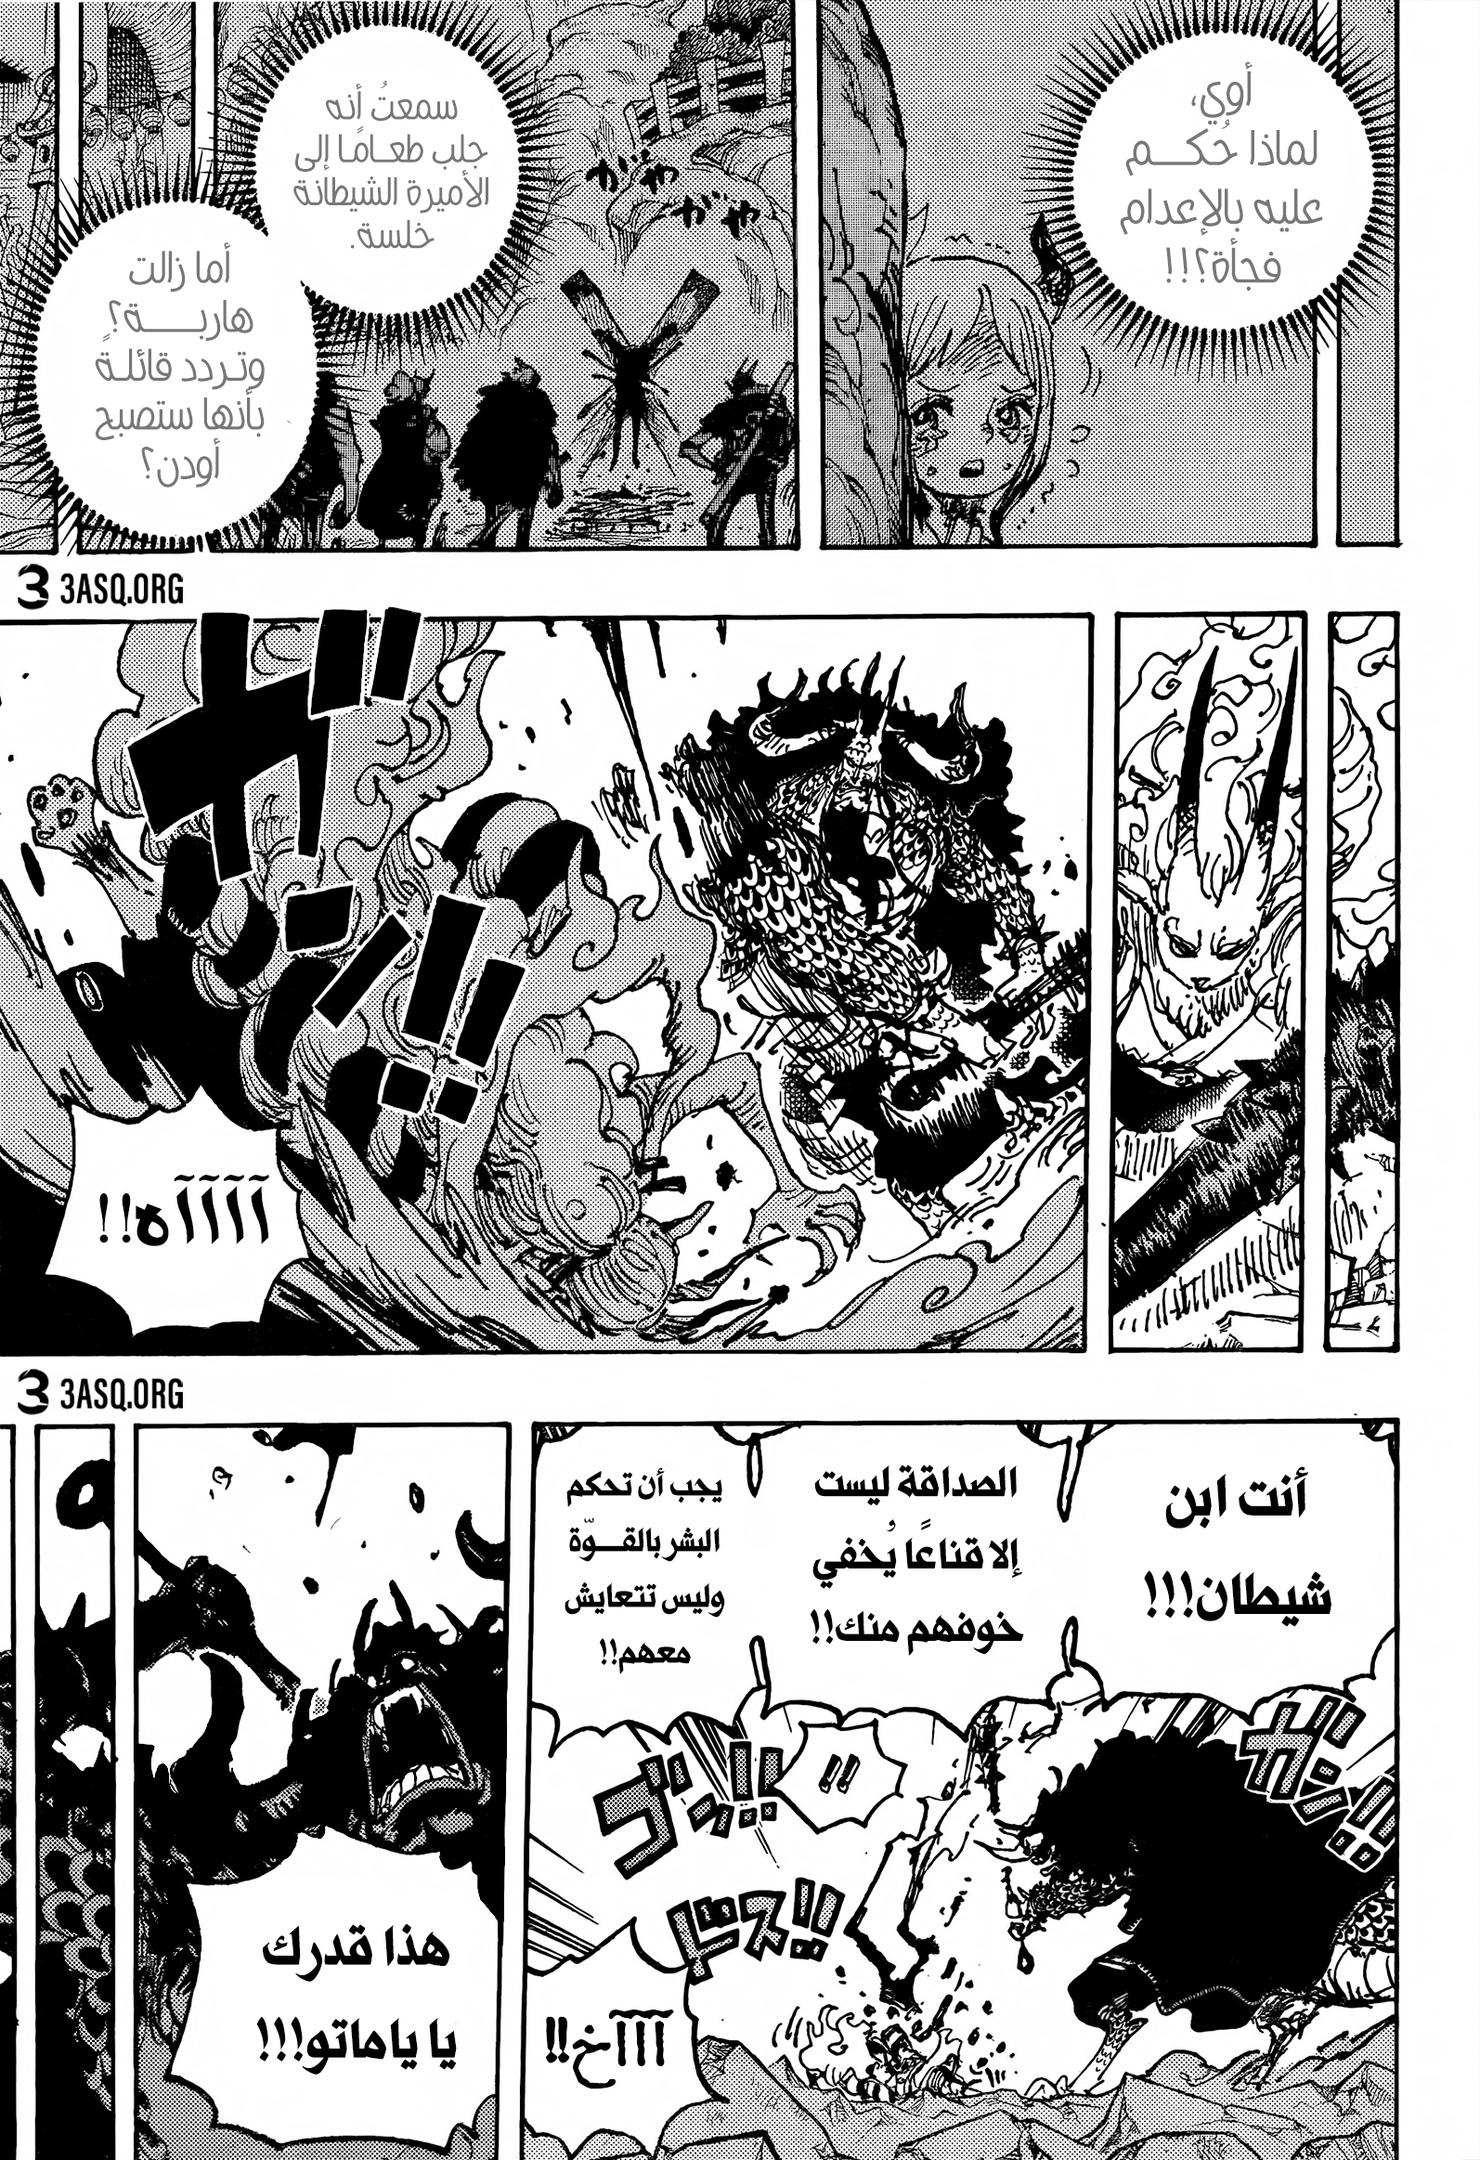 One Piece arab 1025, image №9